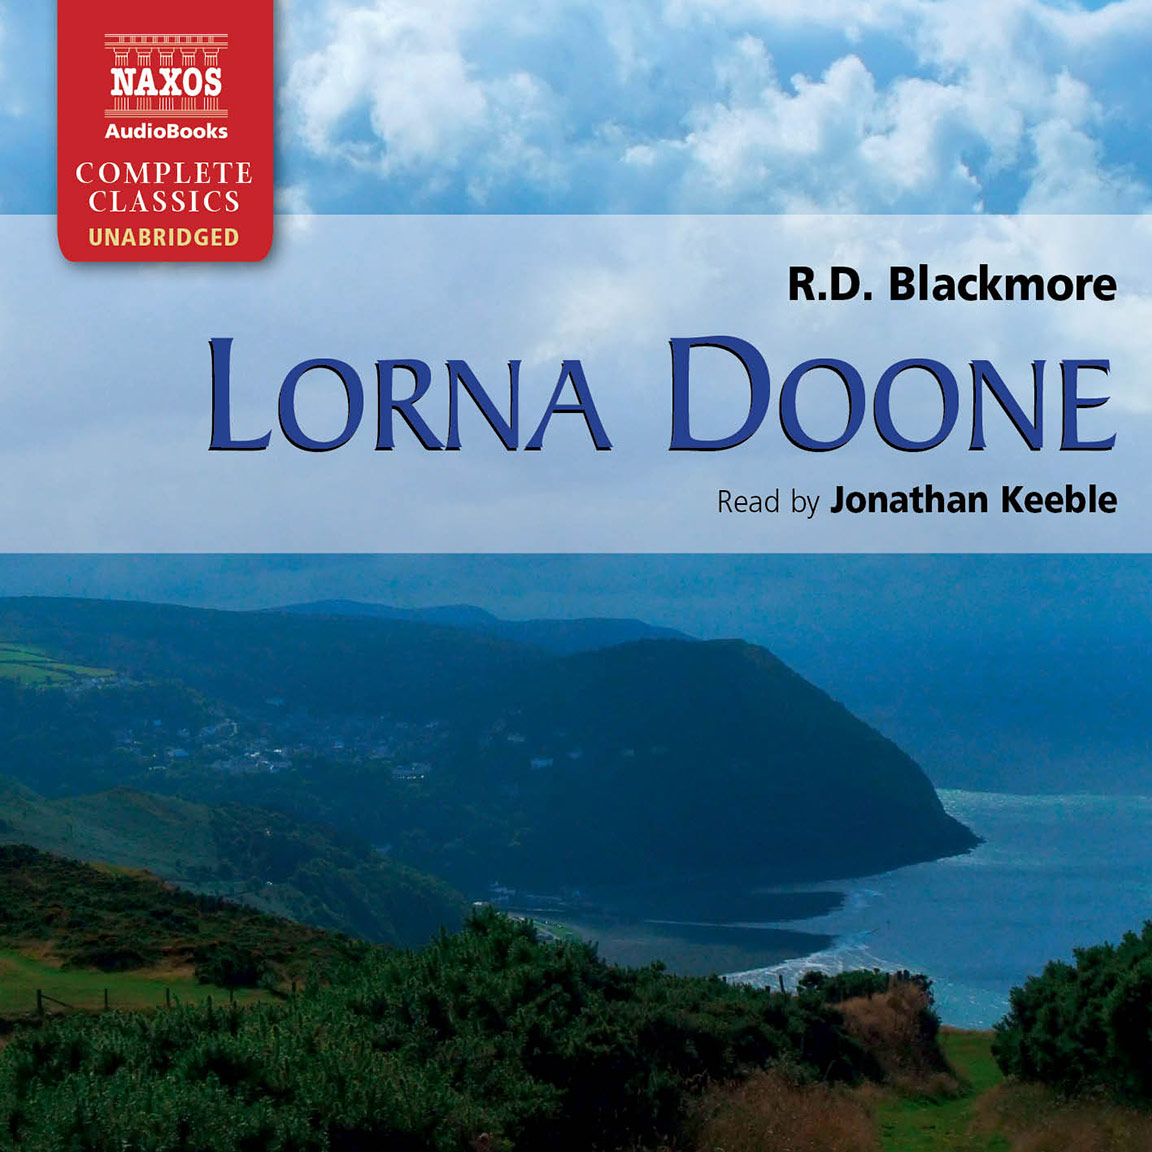 Lorna Doone (unabridged)